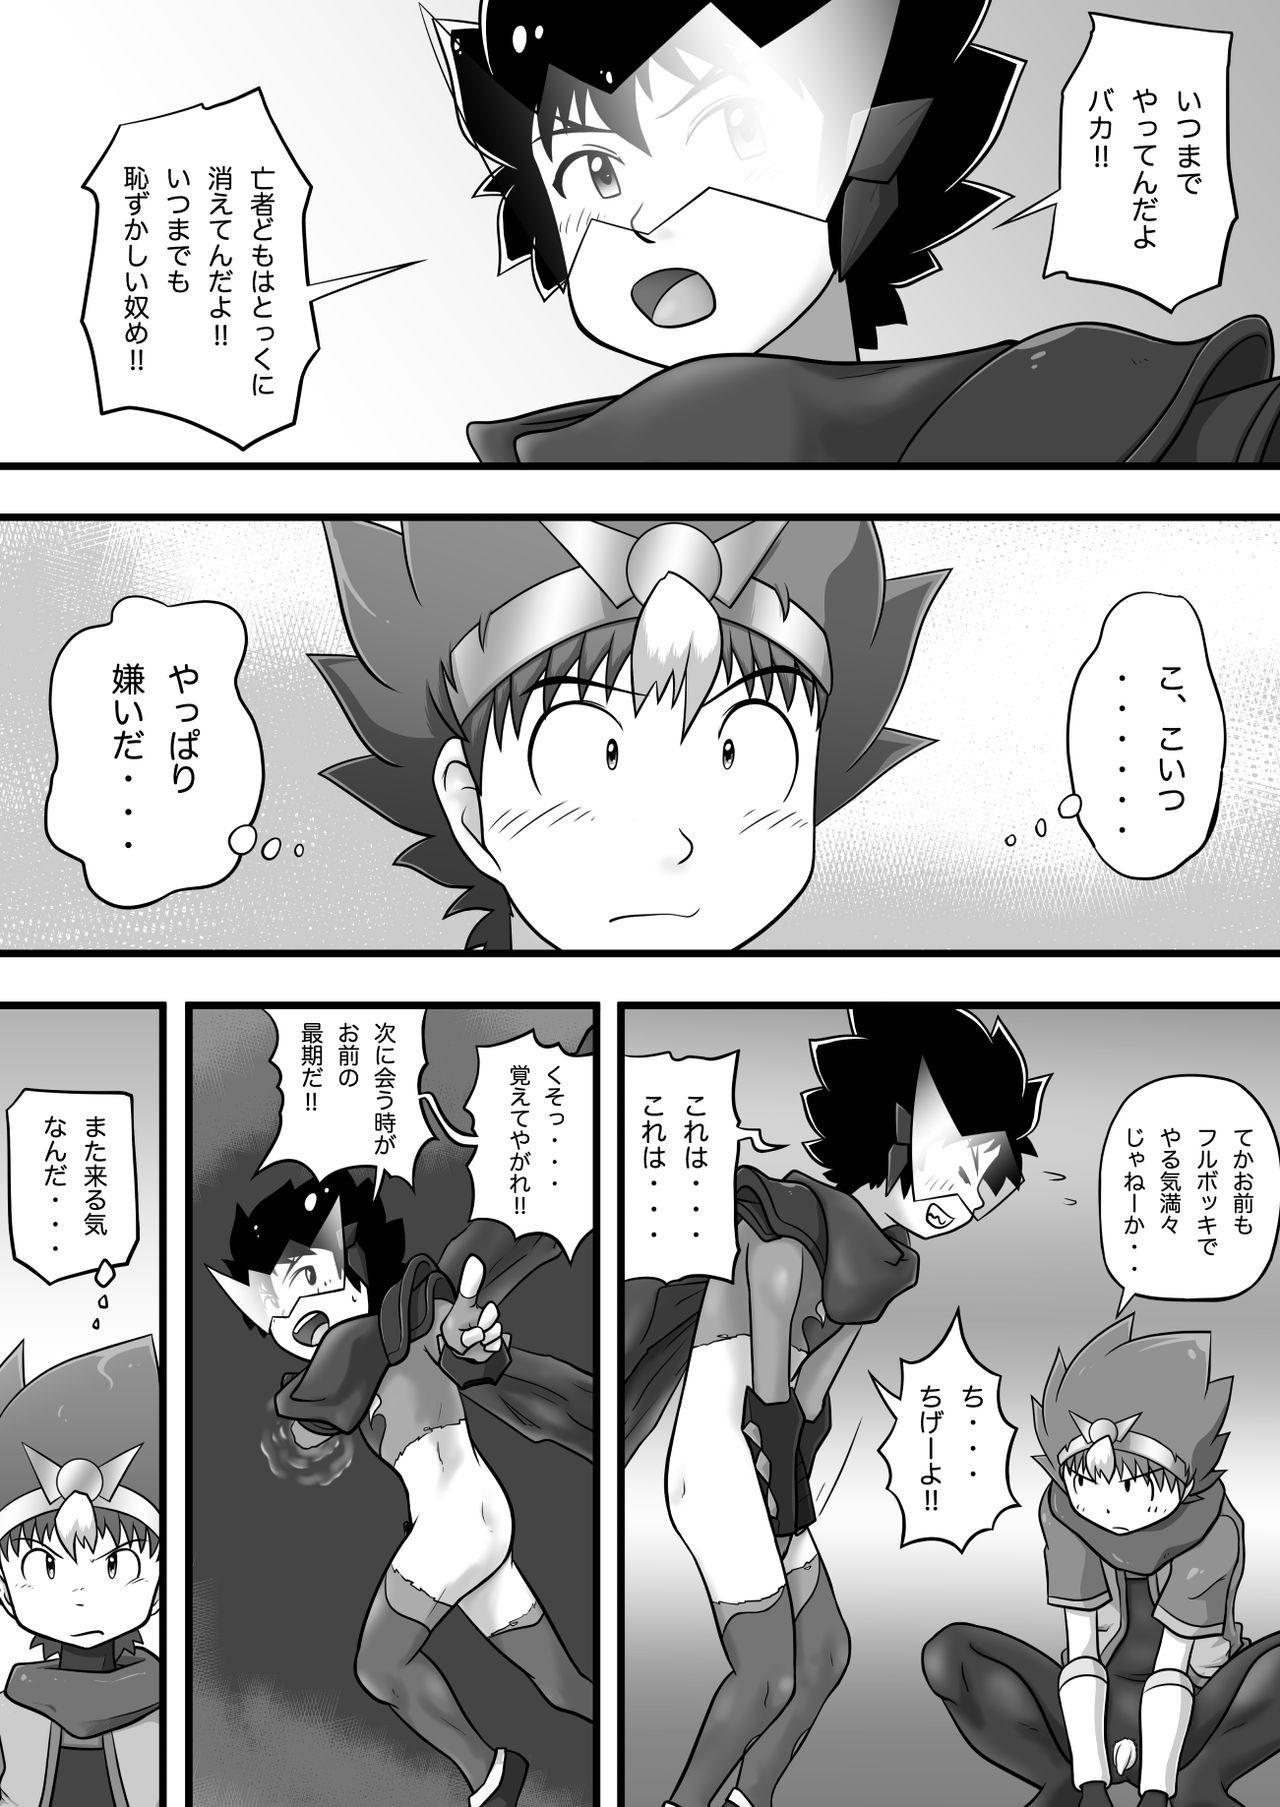 Chrono Kid TSURUGI VS Enboy 32